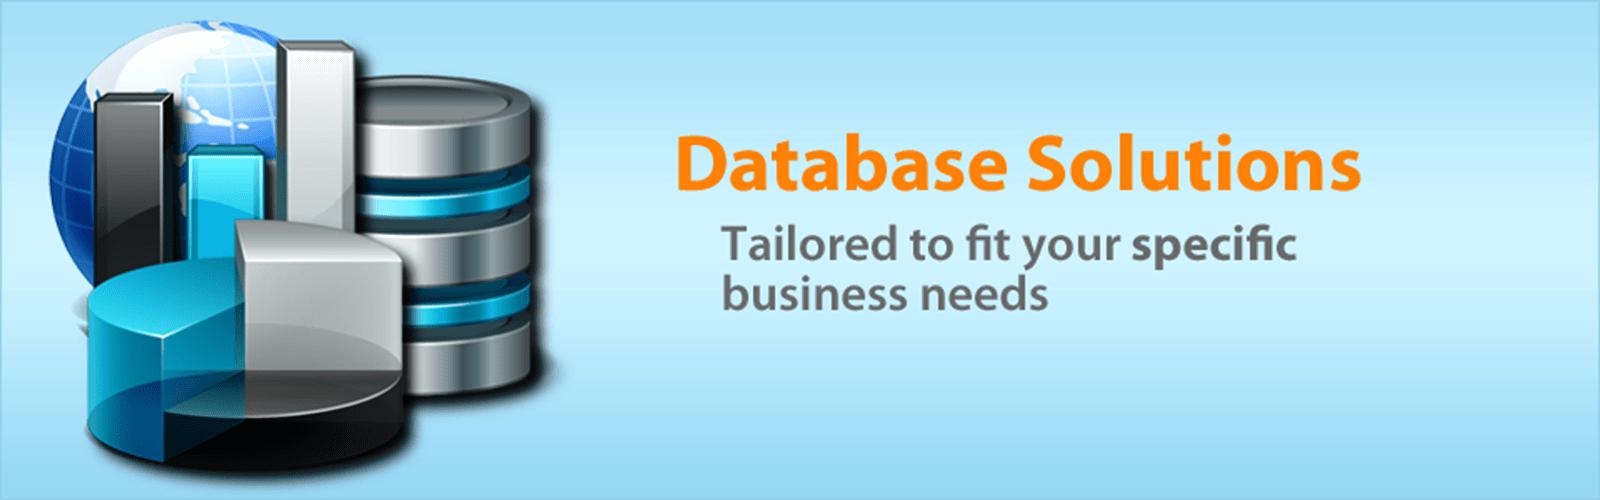 database storage infrastructure